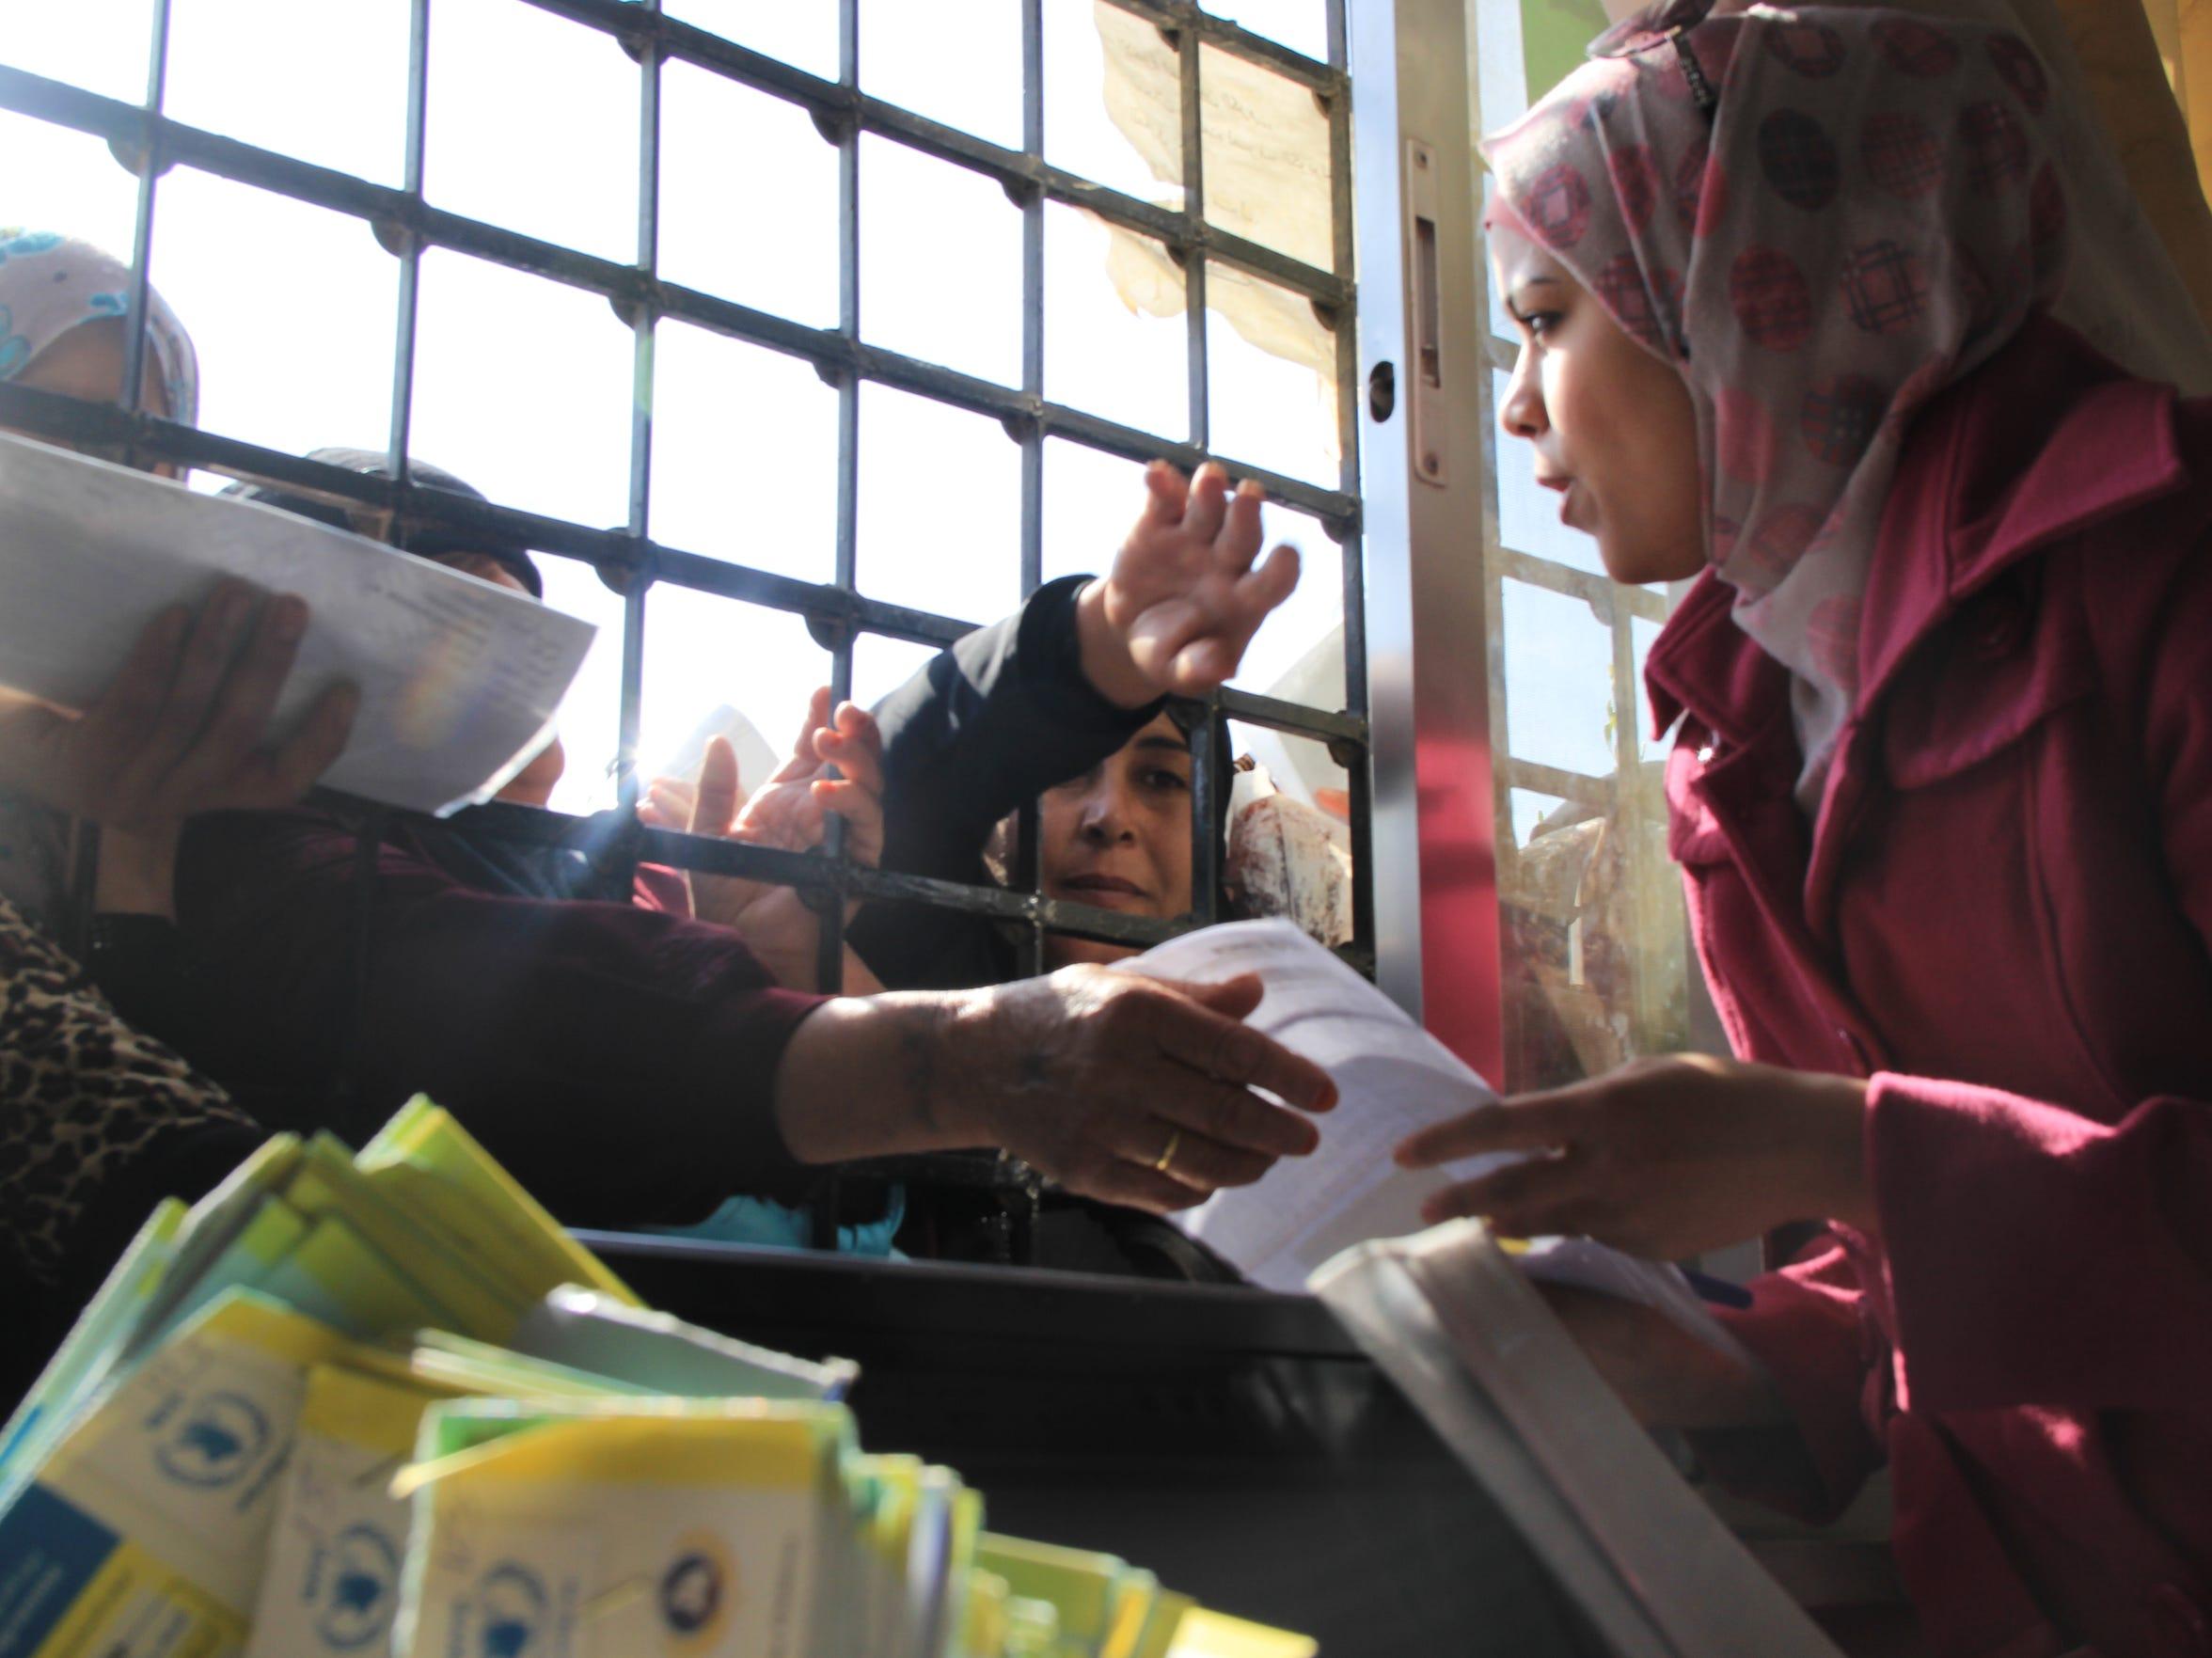 Food aid vouchers in Jordan